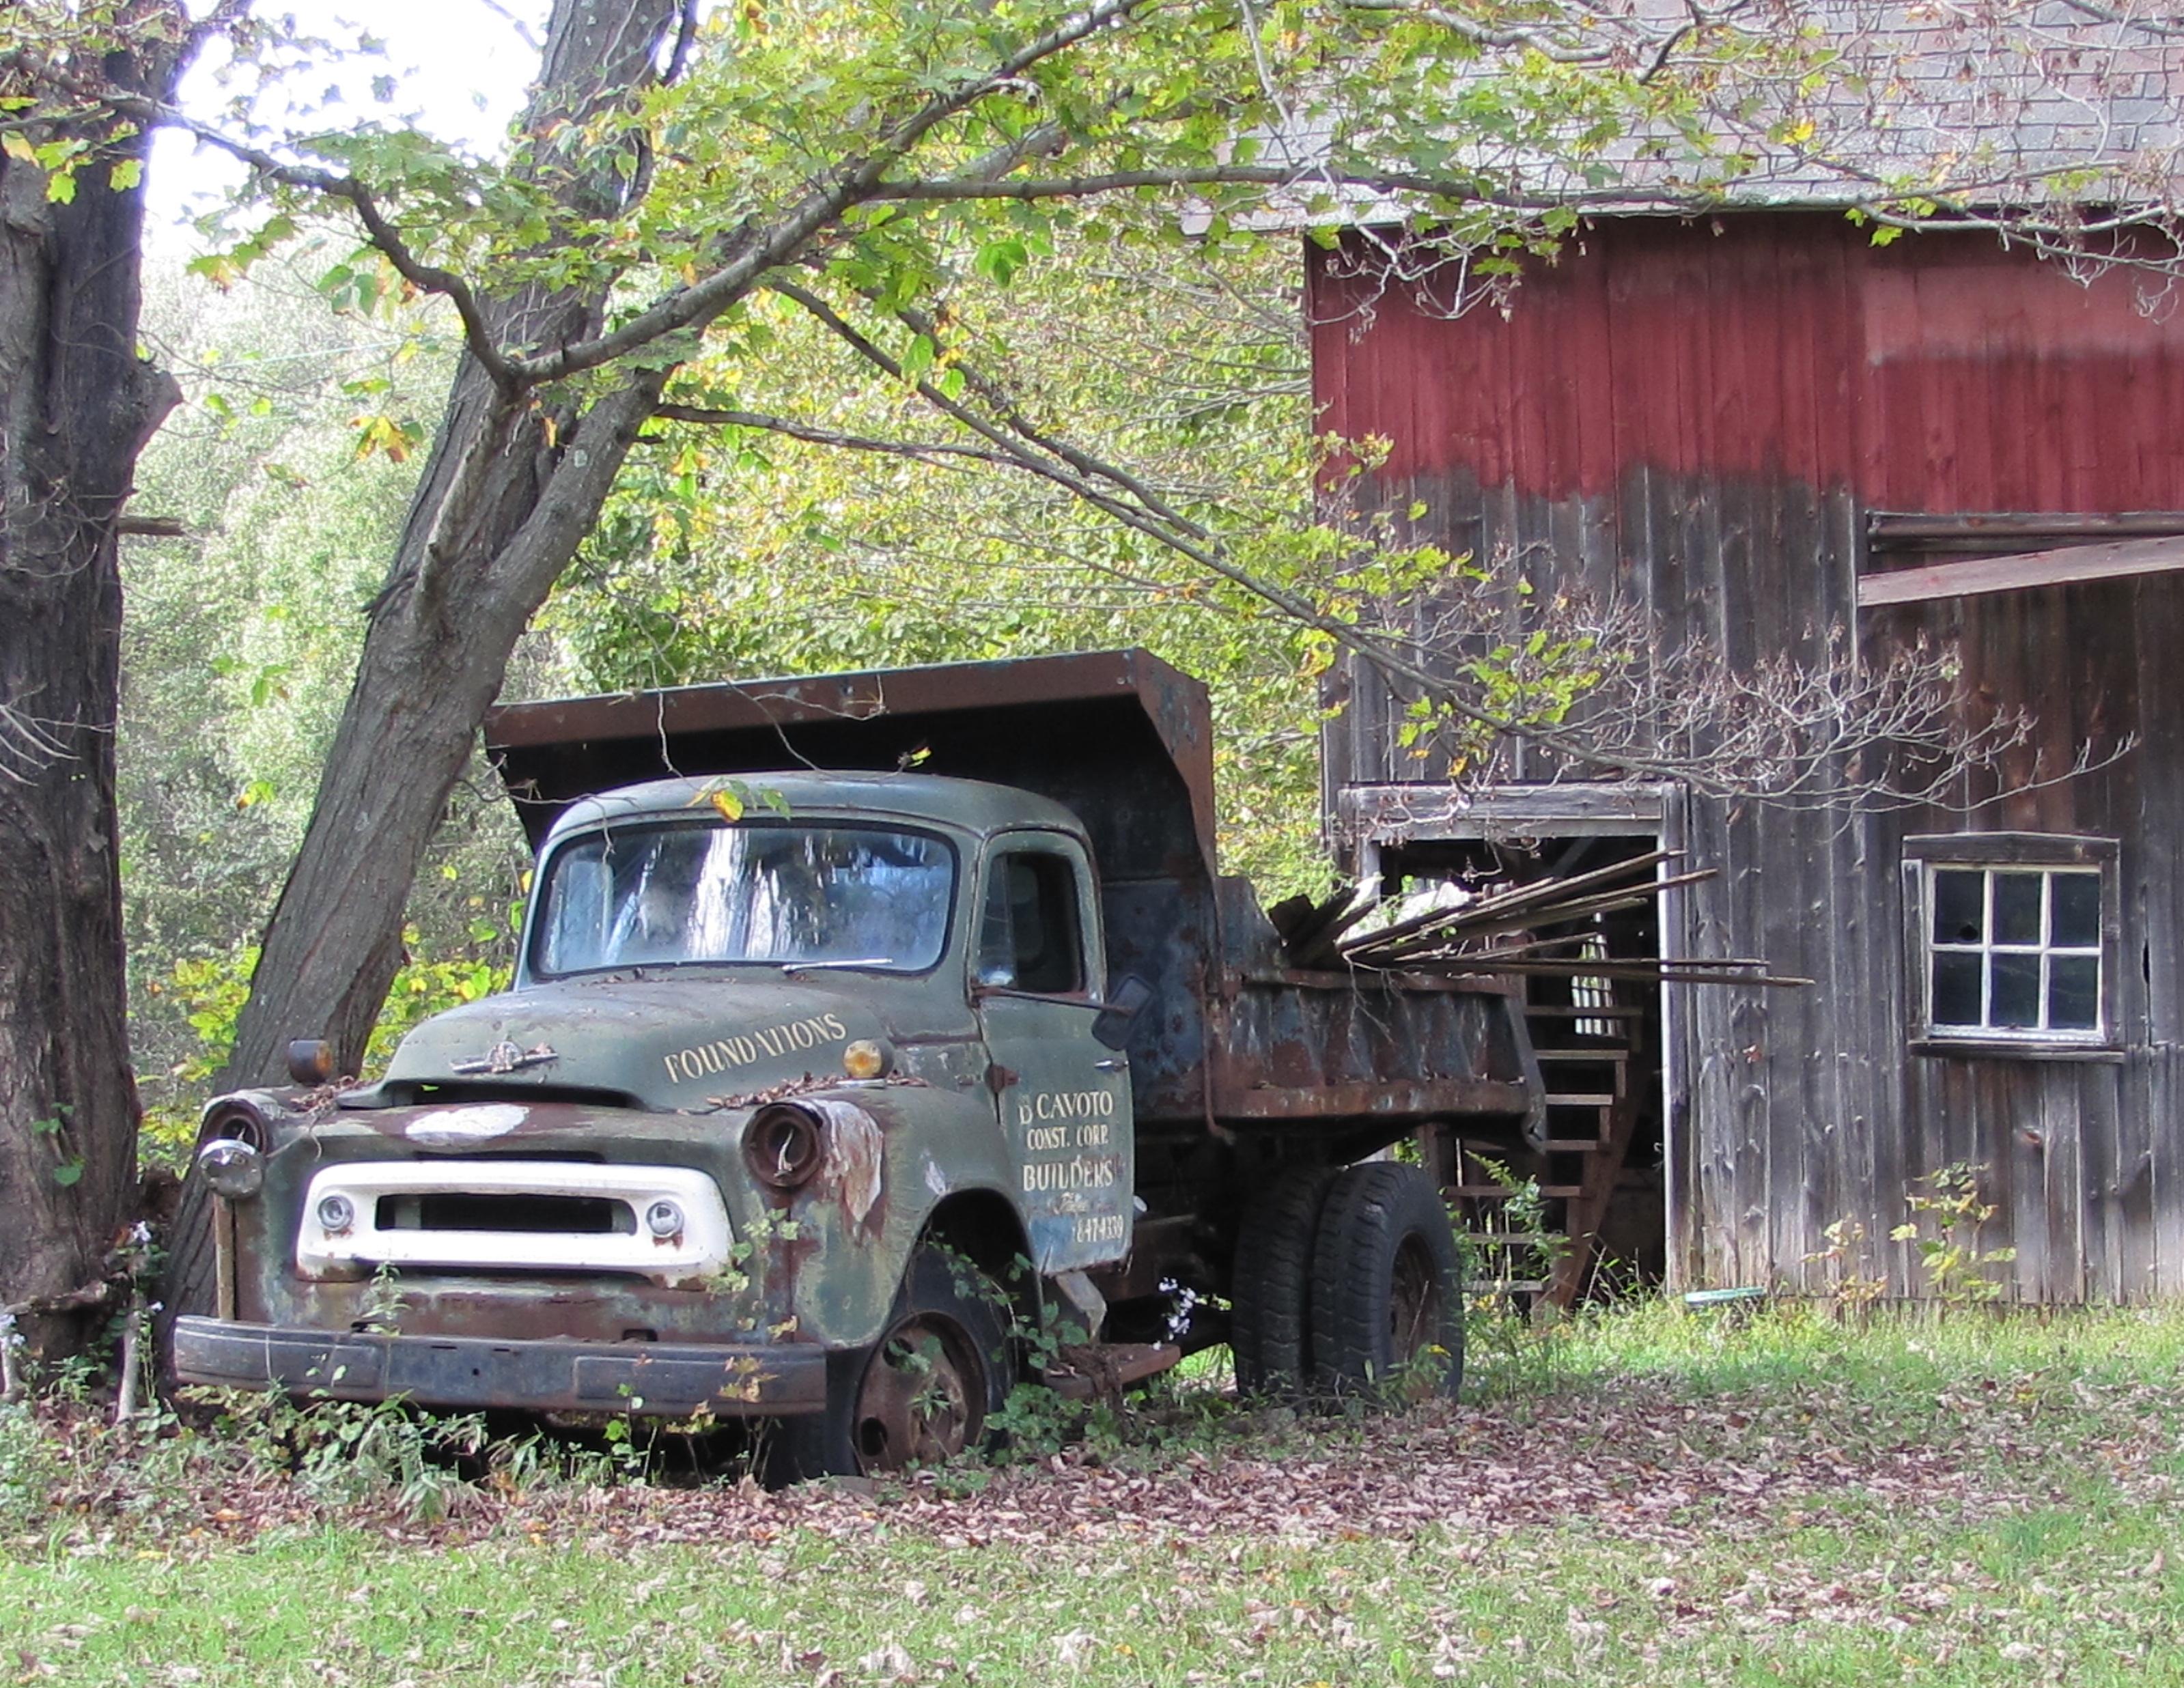 File:Monroe ct truck and barn.jpg - Wikimedia Commons